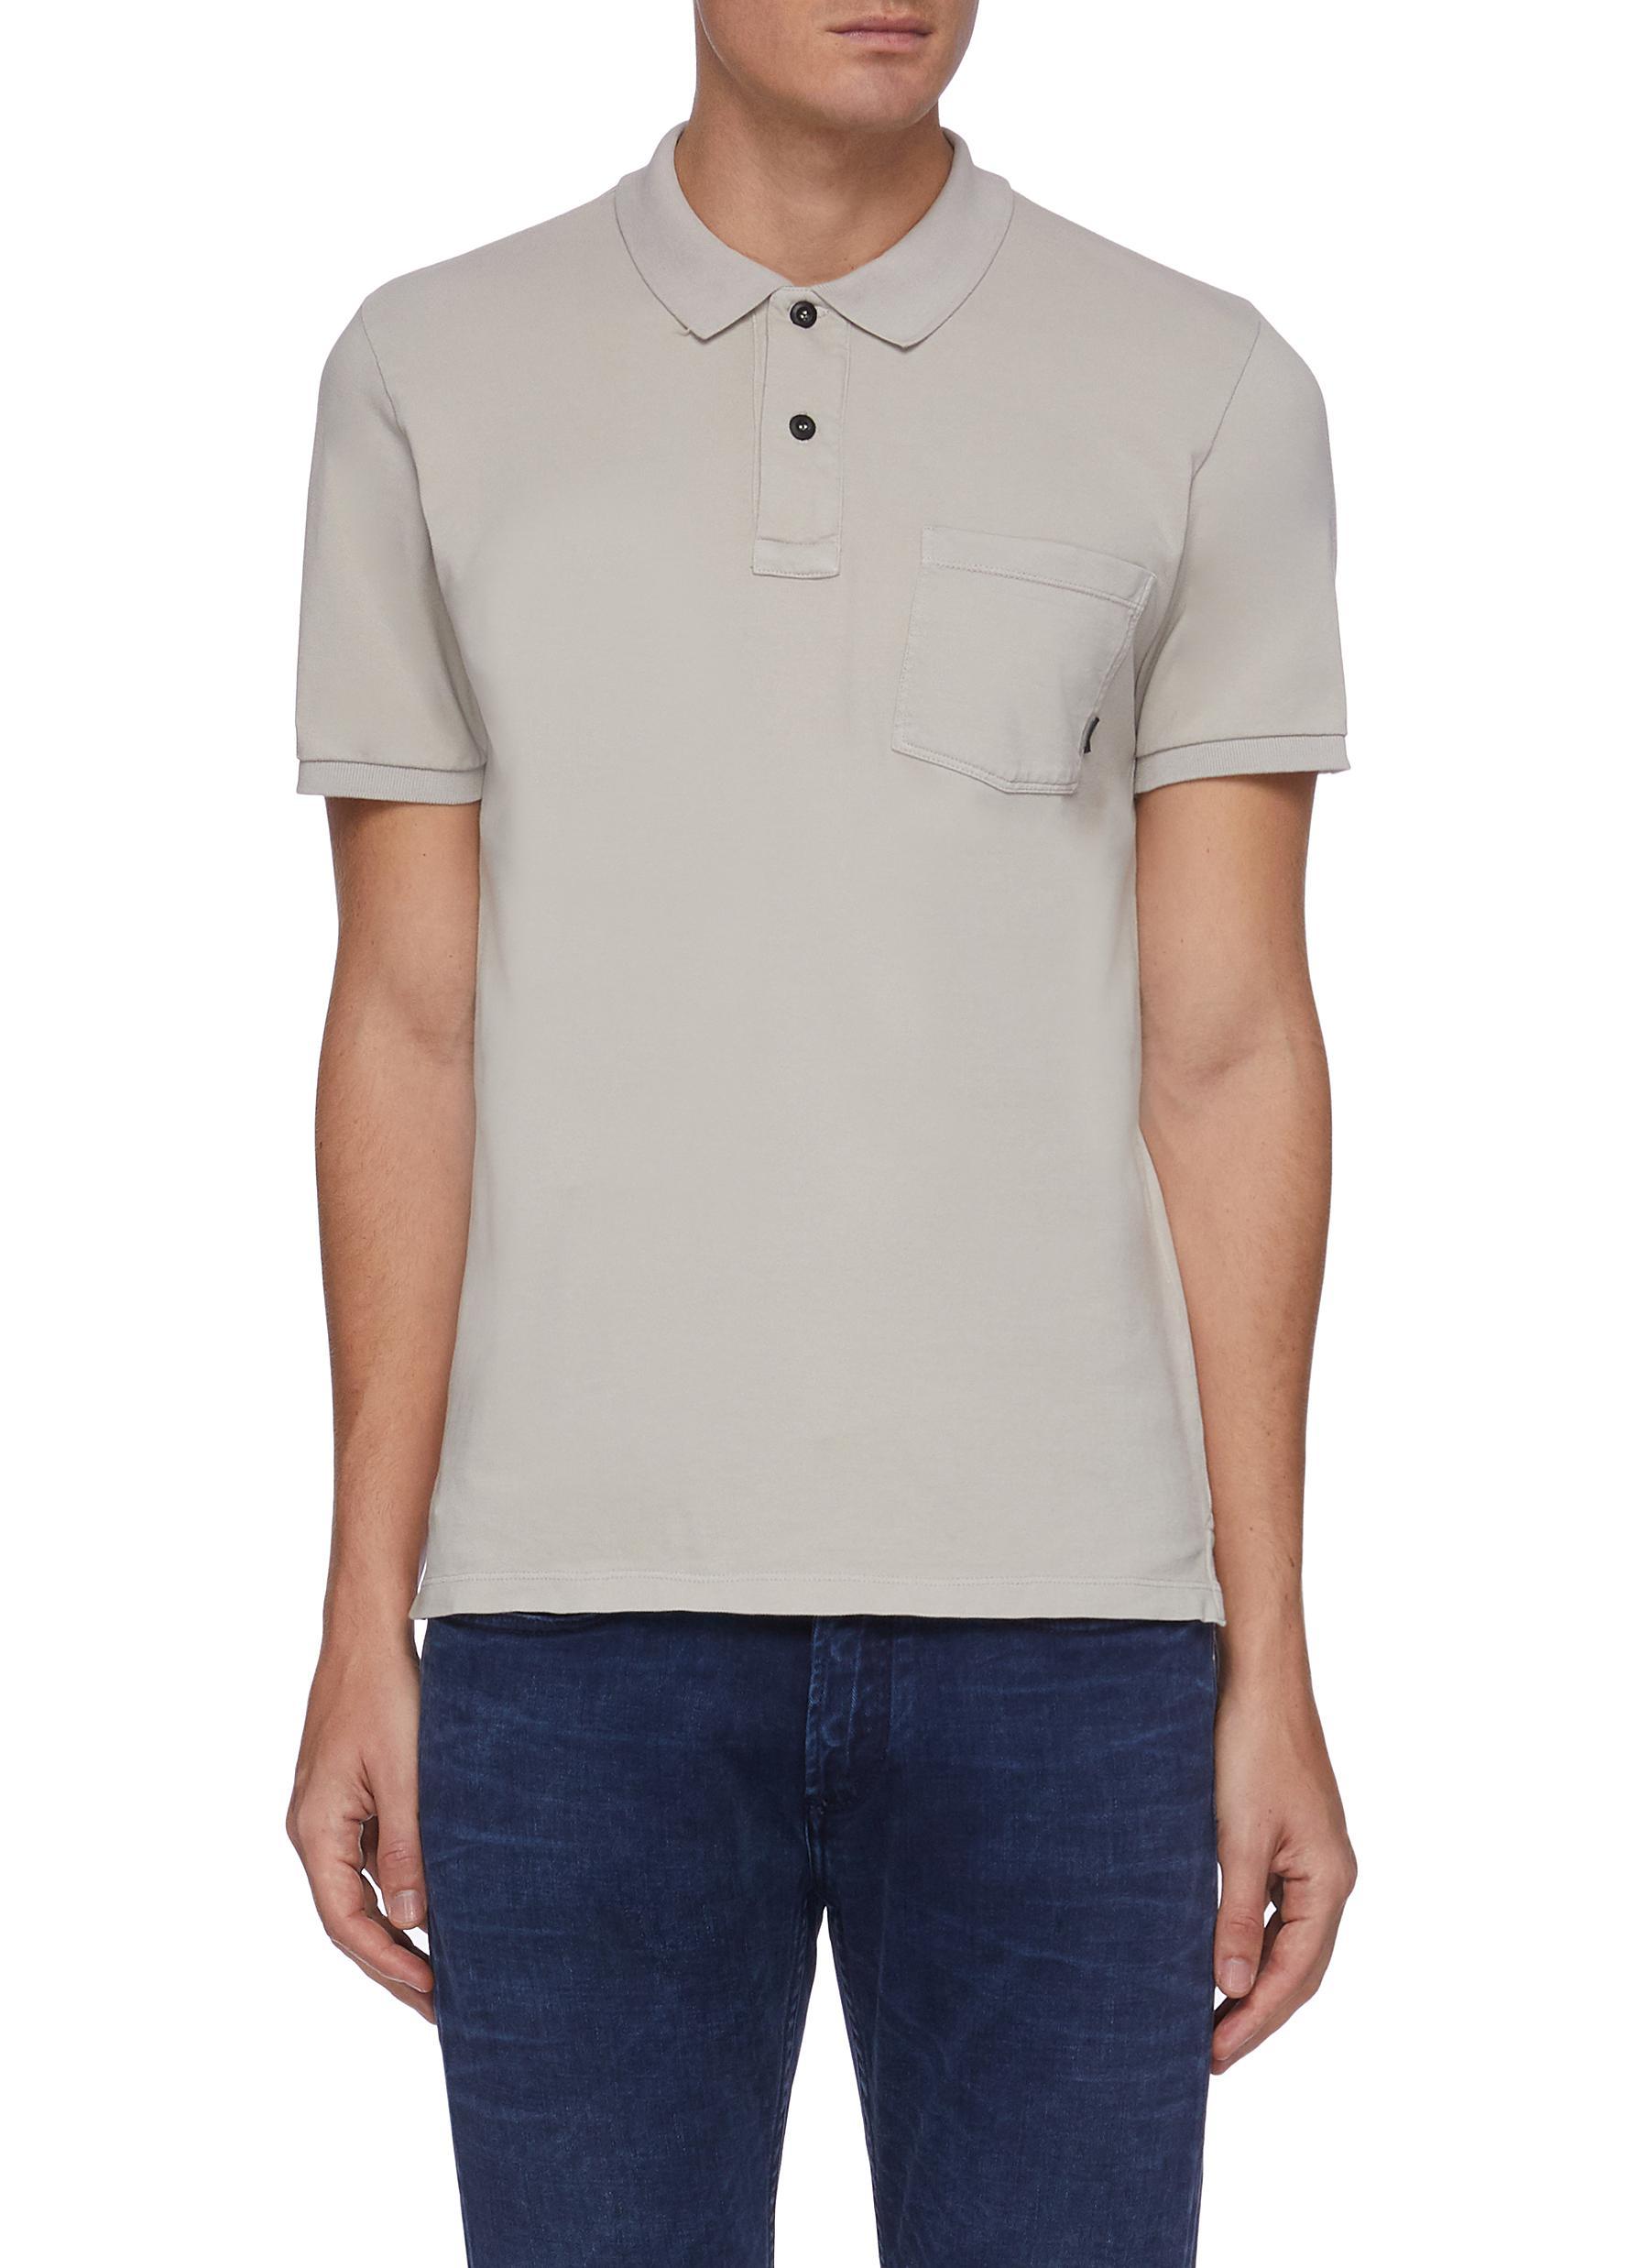 'Regal' Chest Pocket Pique Cotton Polo Shirt